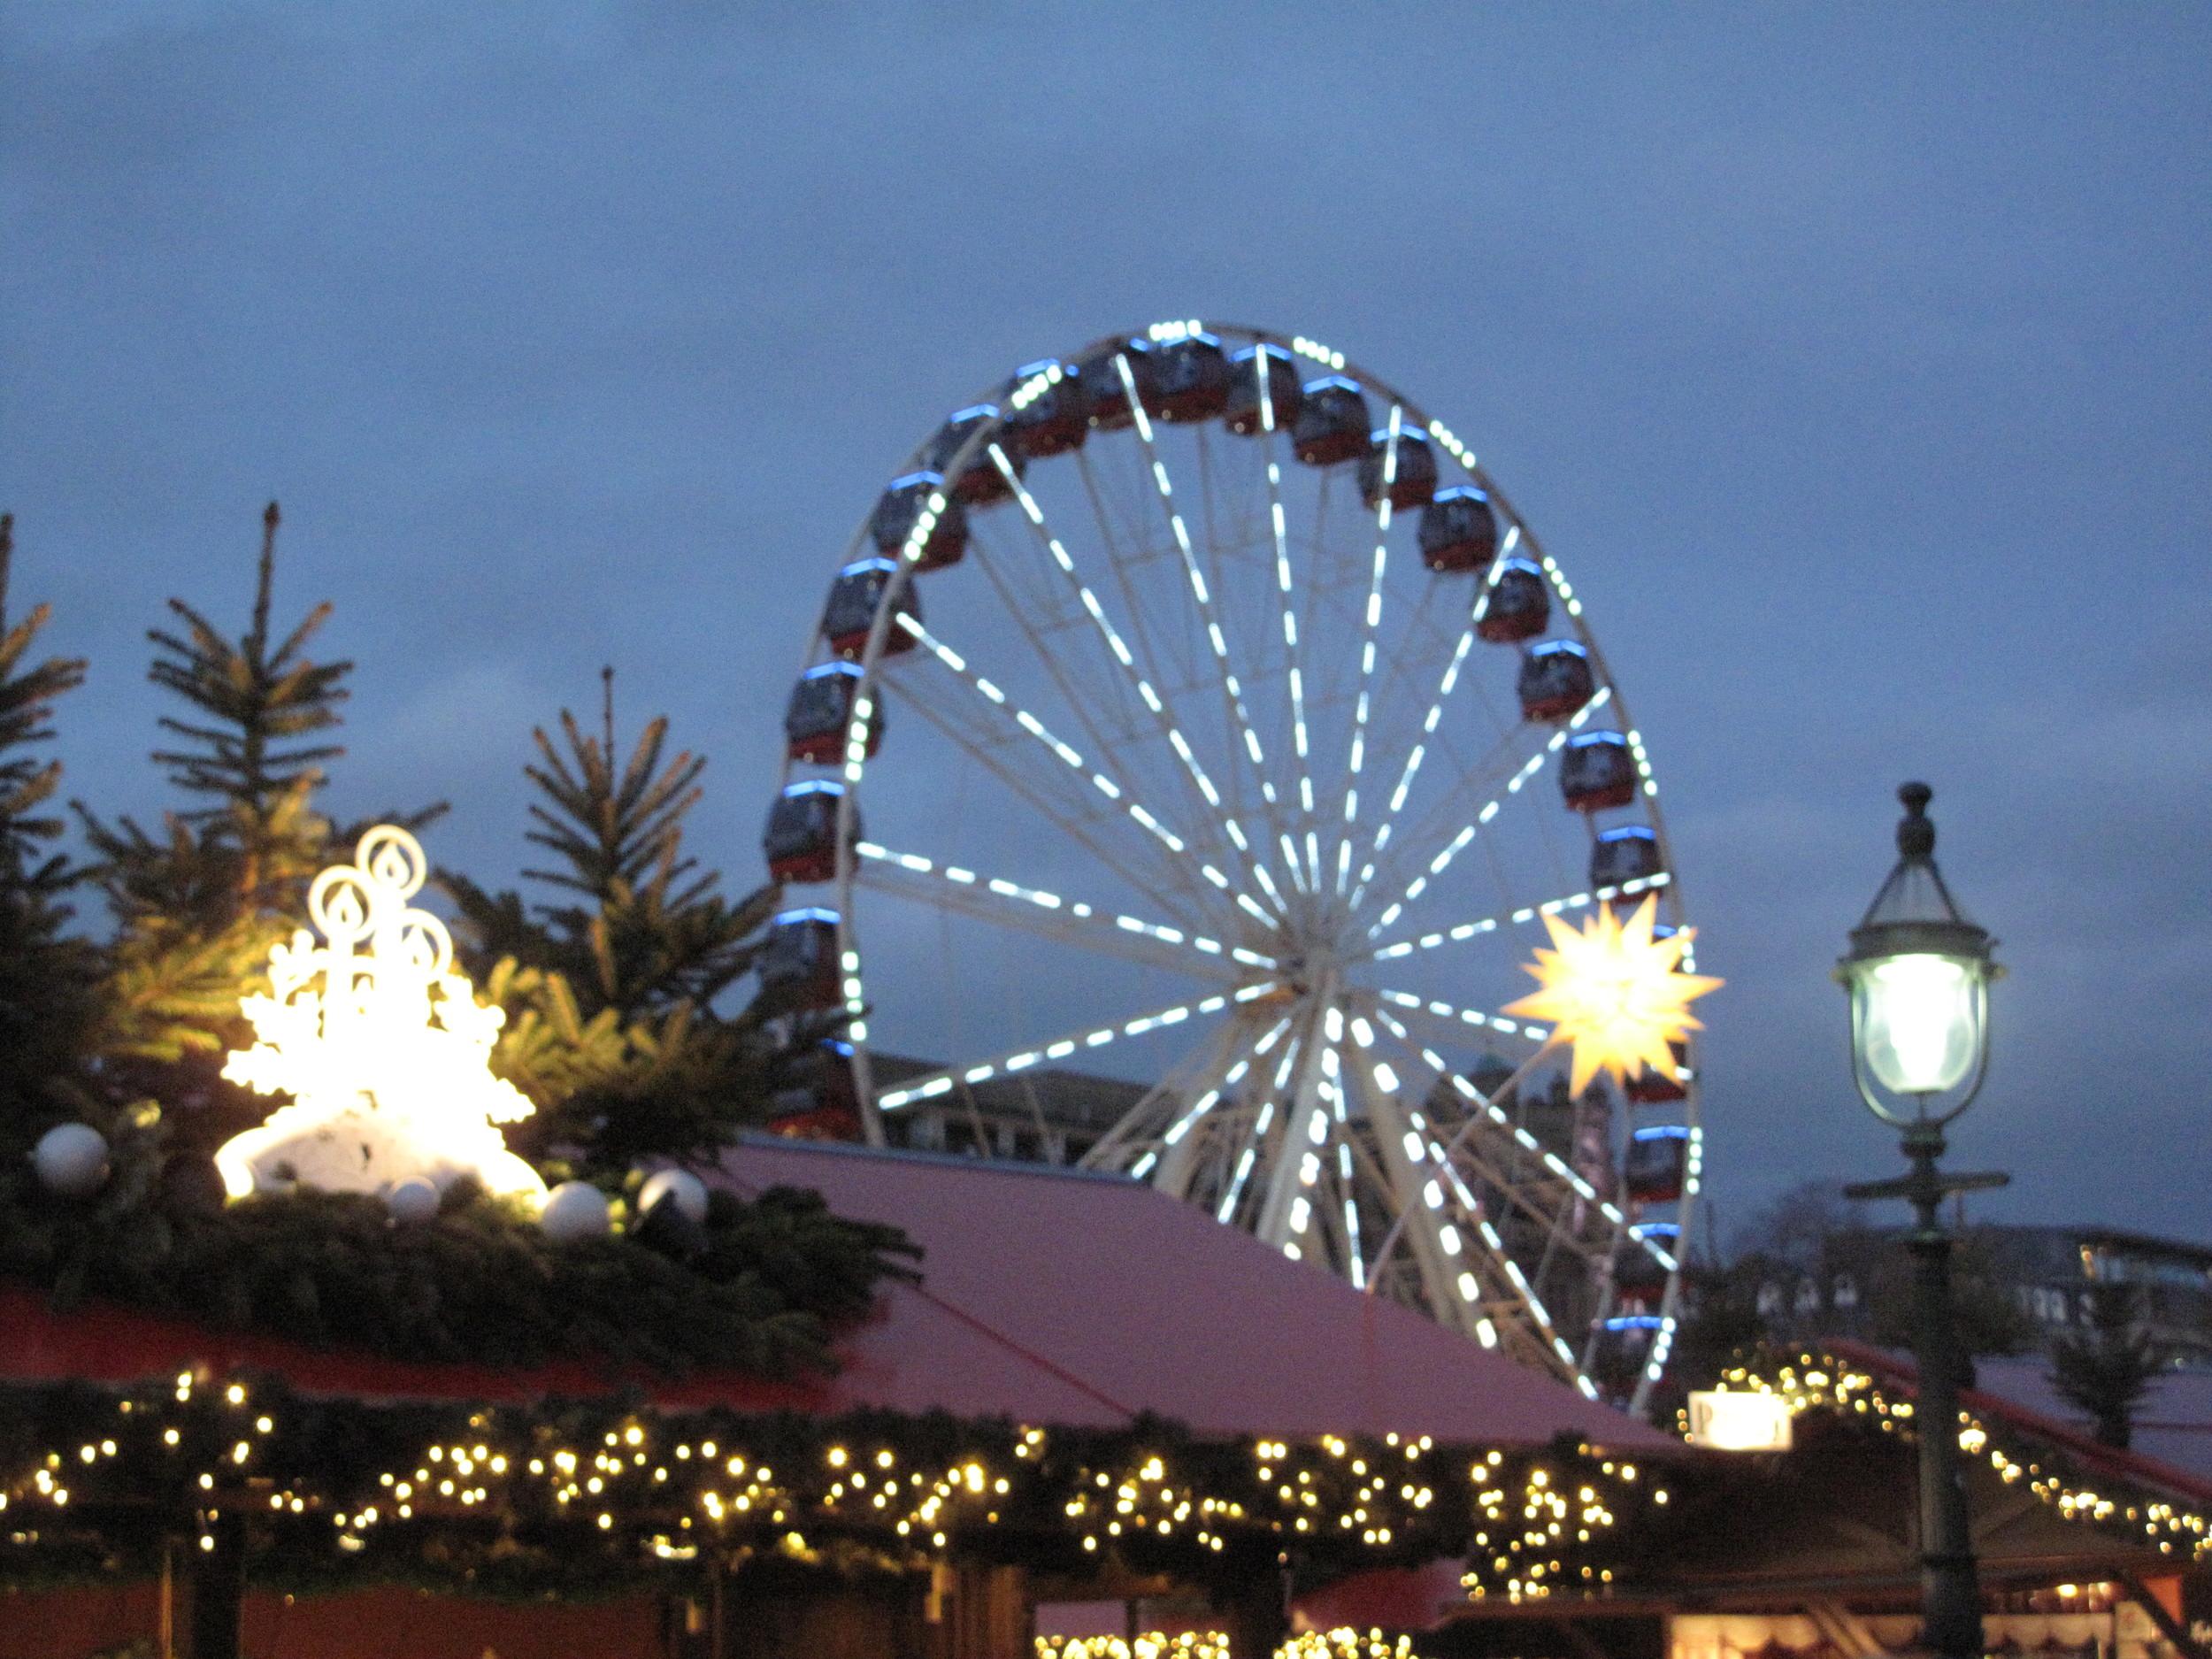 Princes Street Christmas market with the ferris wheel lit up at night time, Edinburgh.